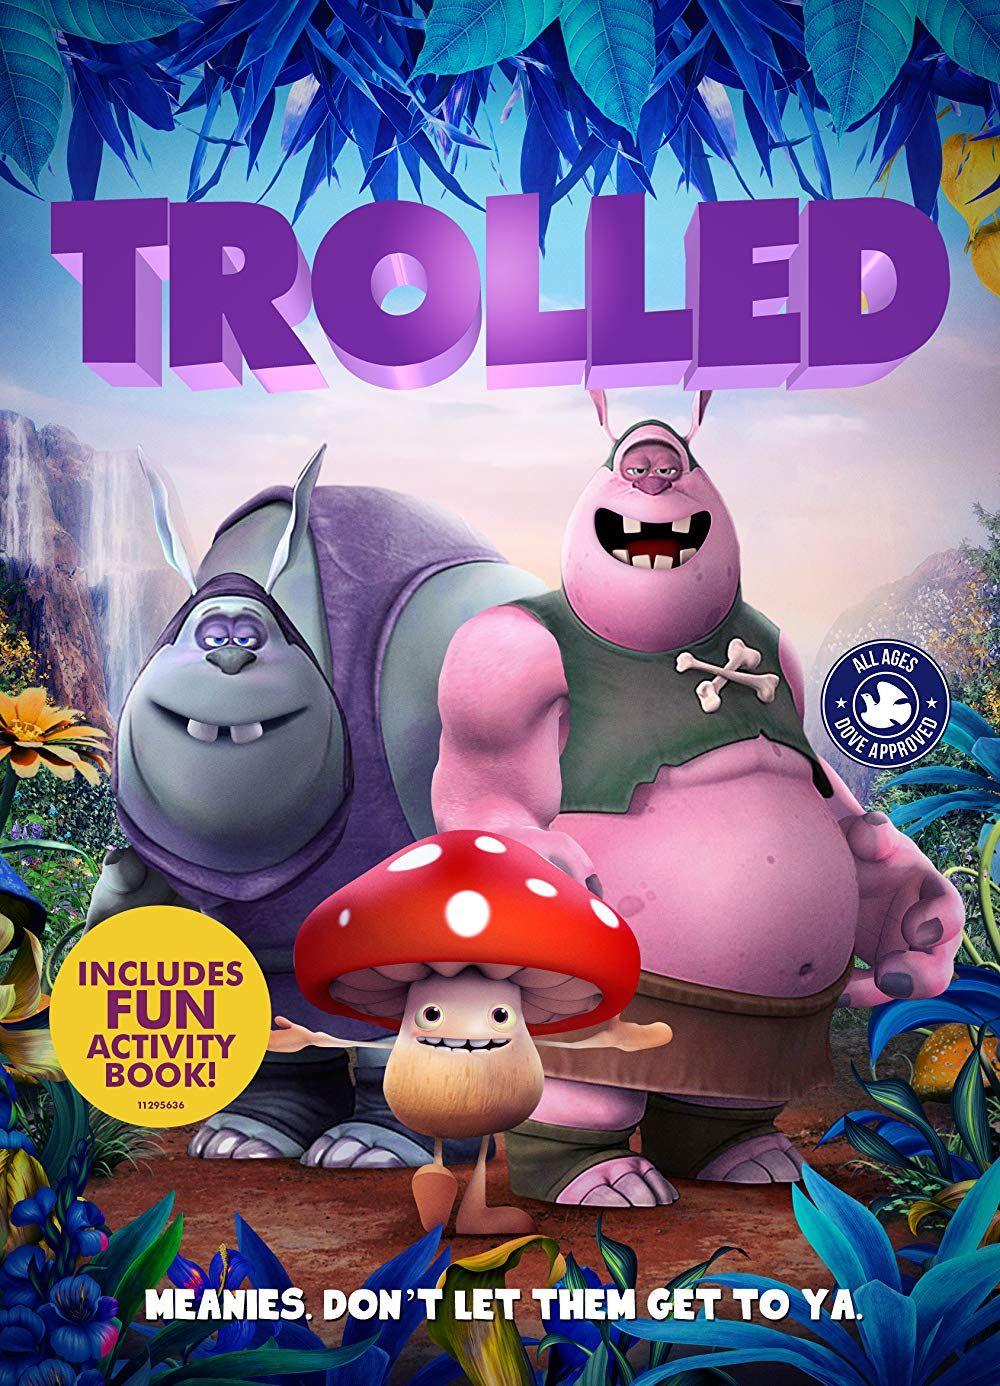 Trolled 2018 Watch Movie Hd Online Free Cartoons Full Movie Full Movies Movies To Watch Online